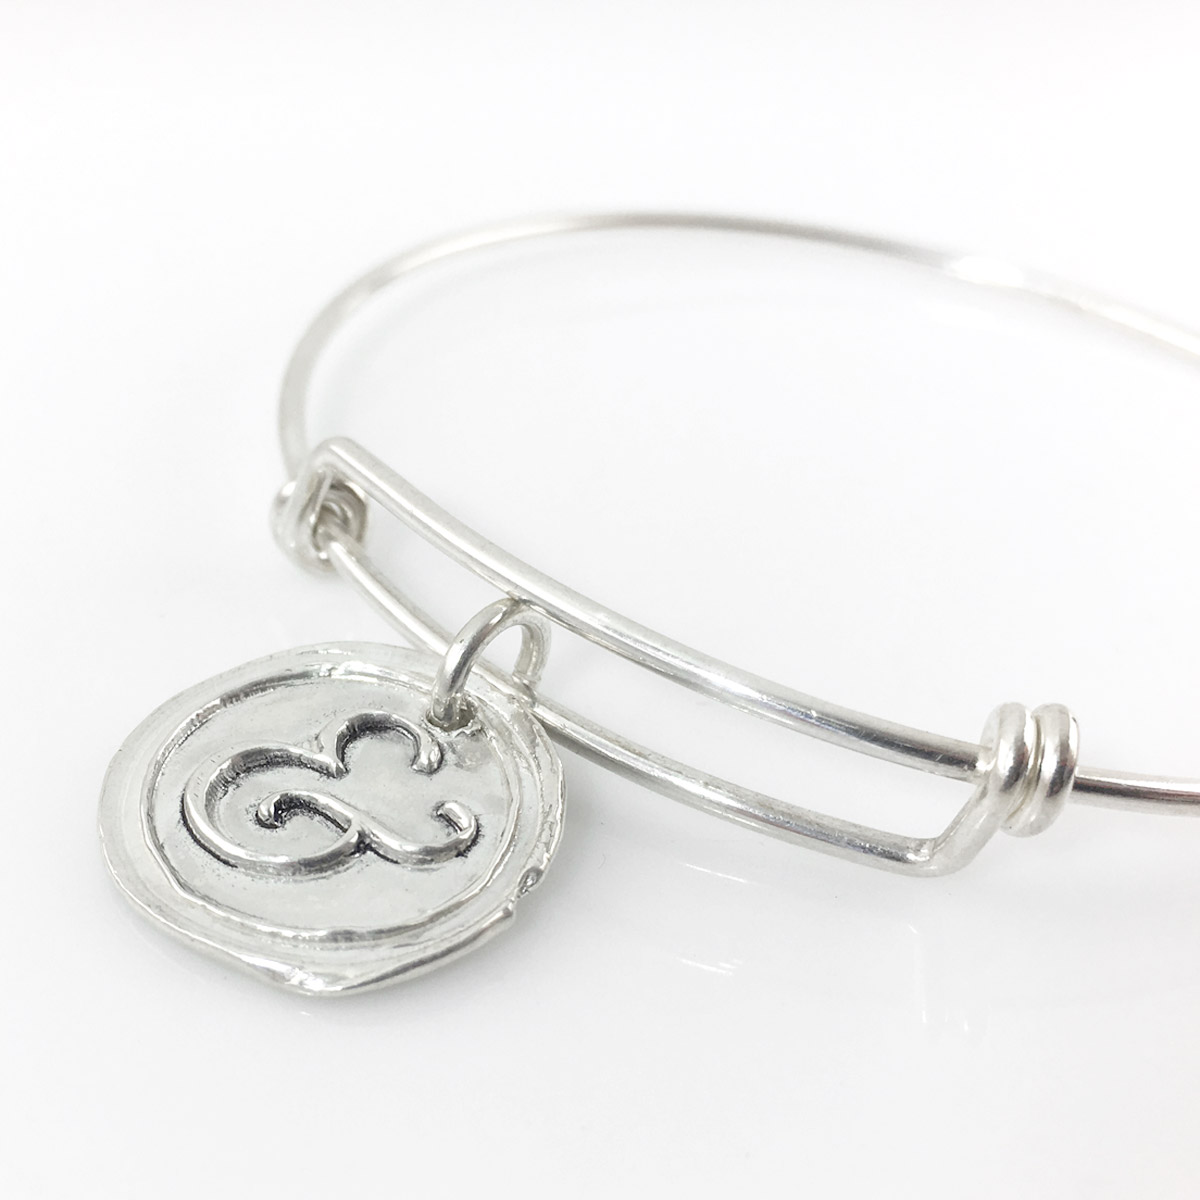 Ampersand Wax Seal Inspired Bangle Bracelet